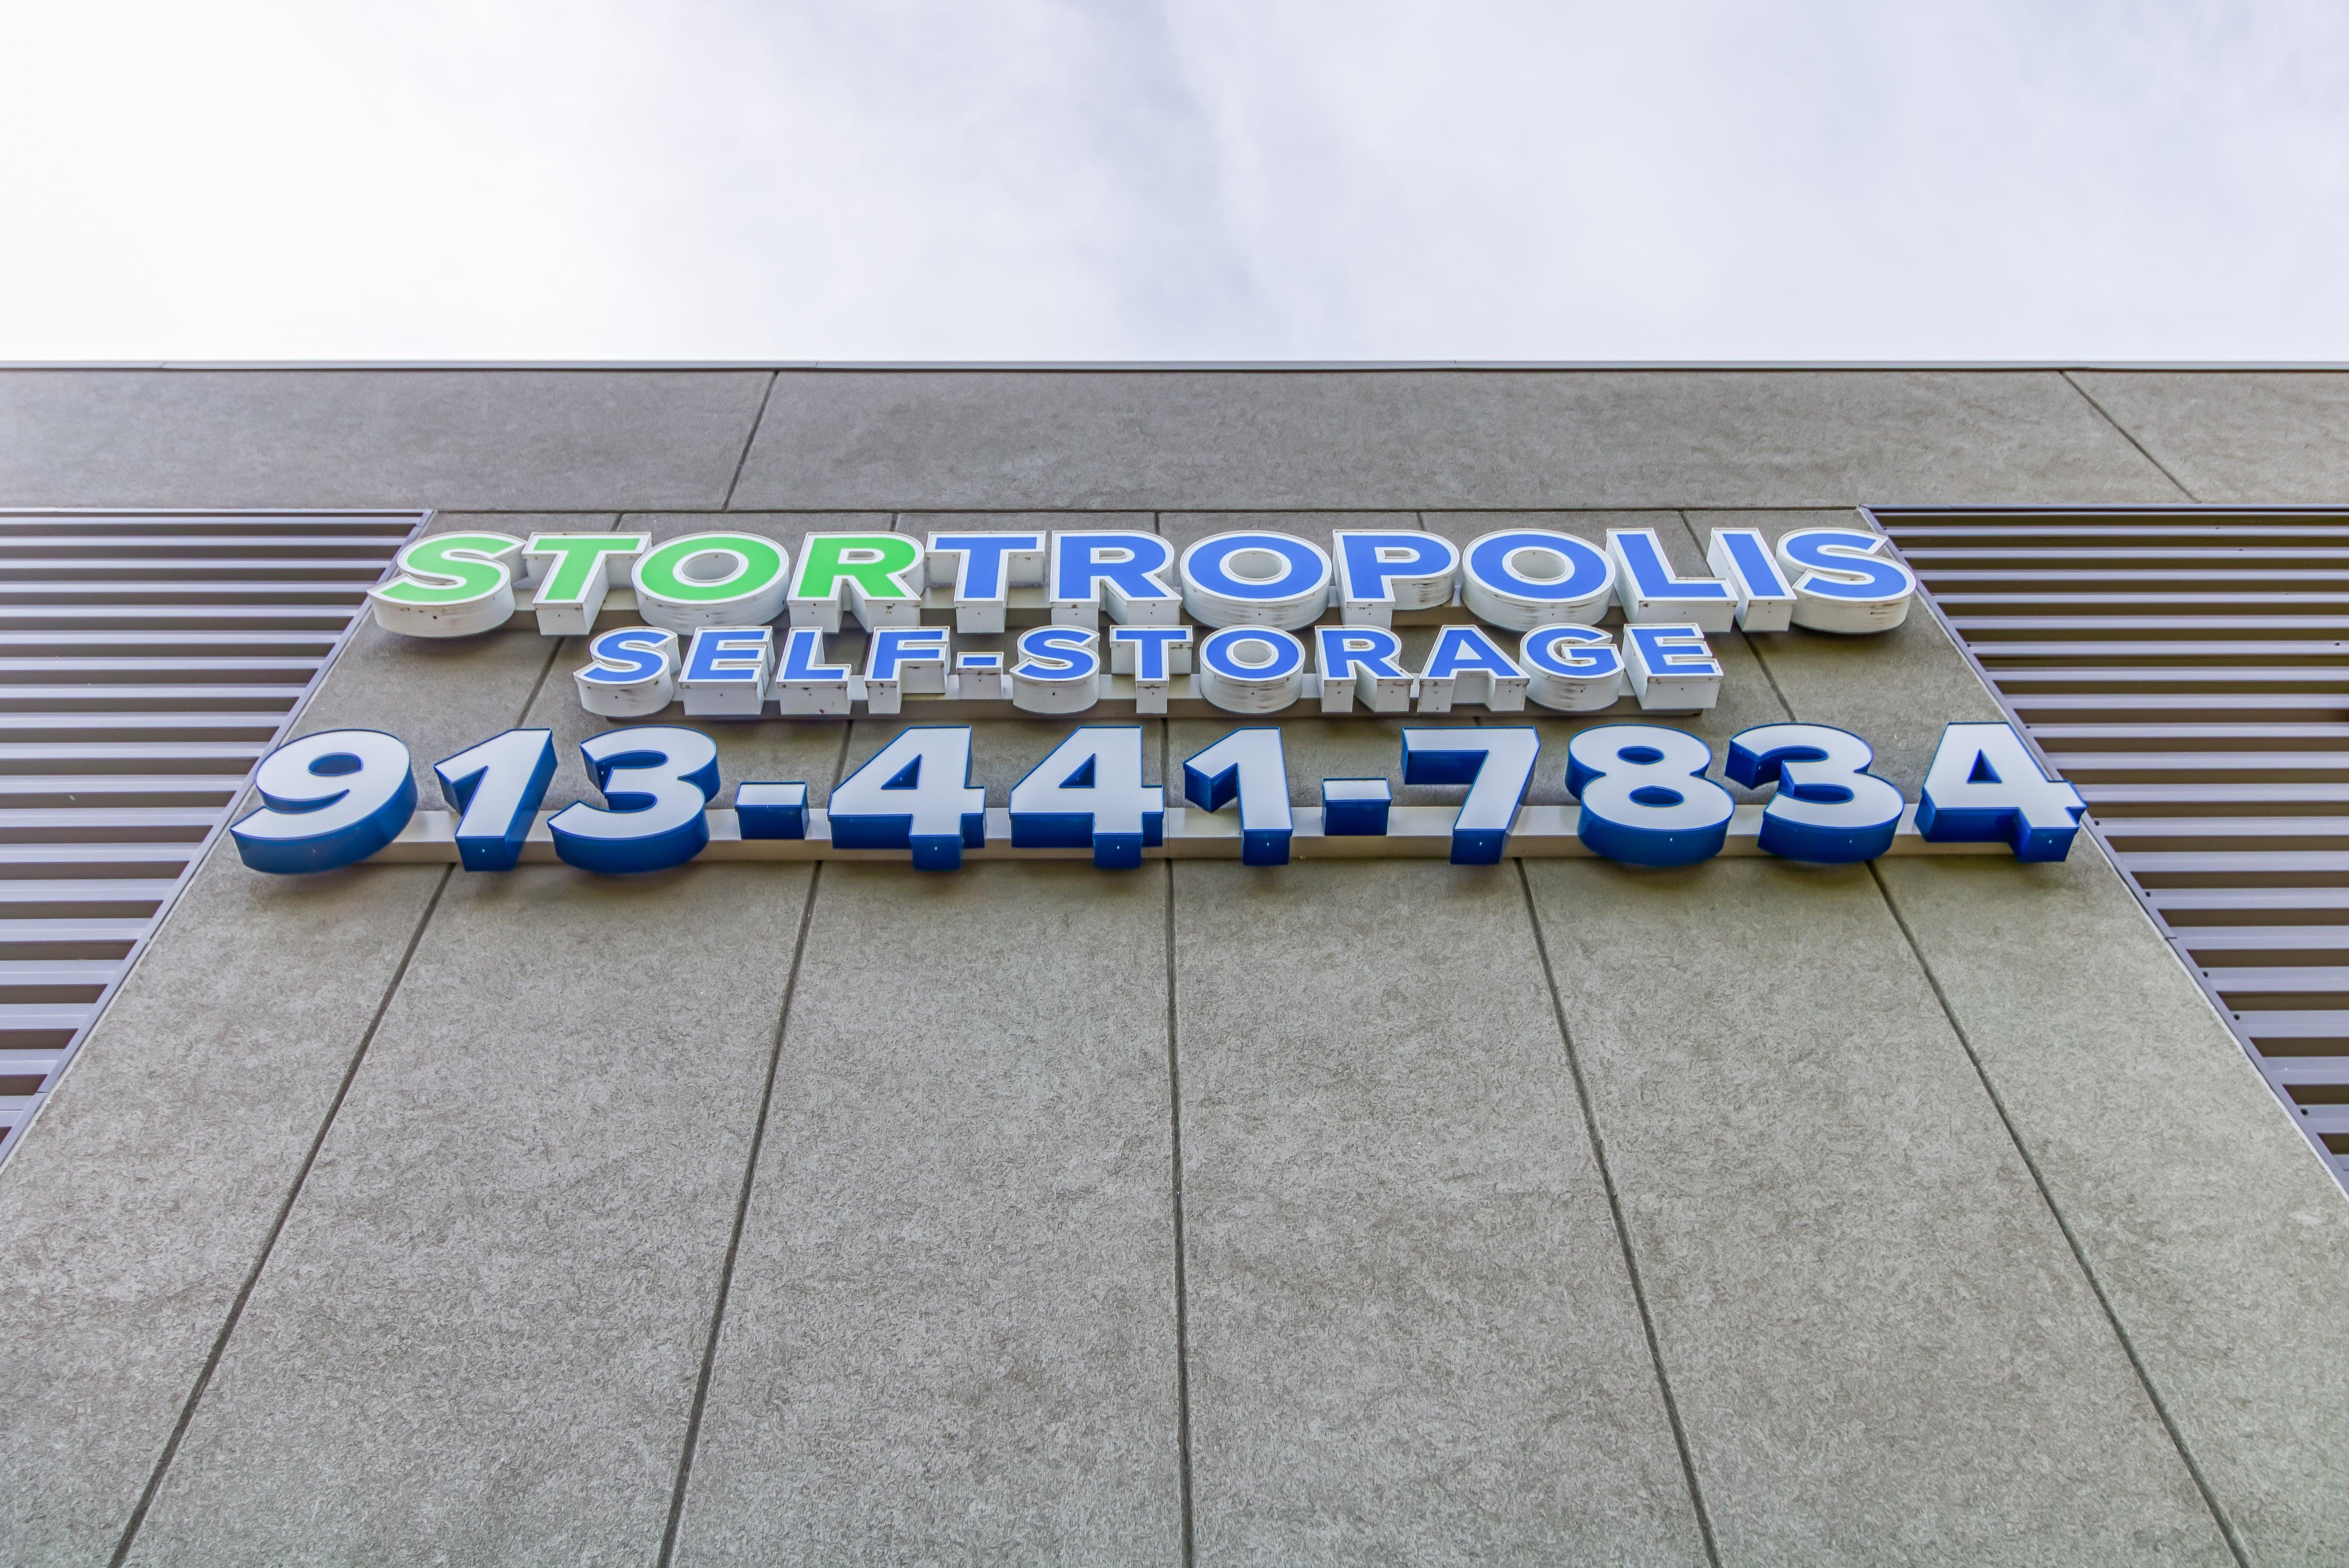 StorTropolis Self Storage in Shawnee KS